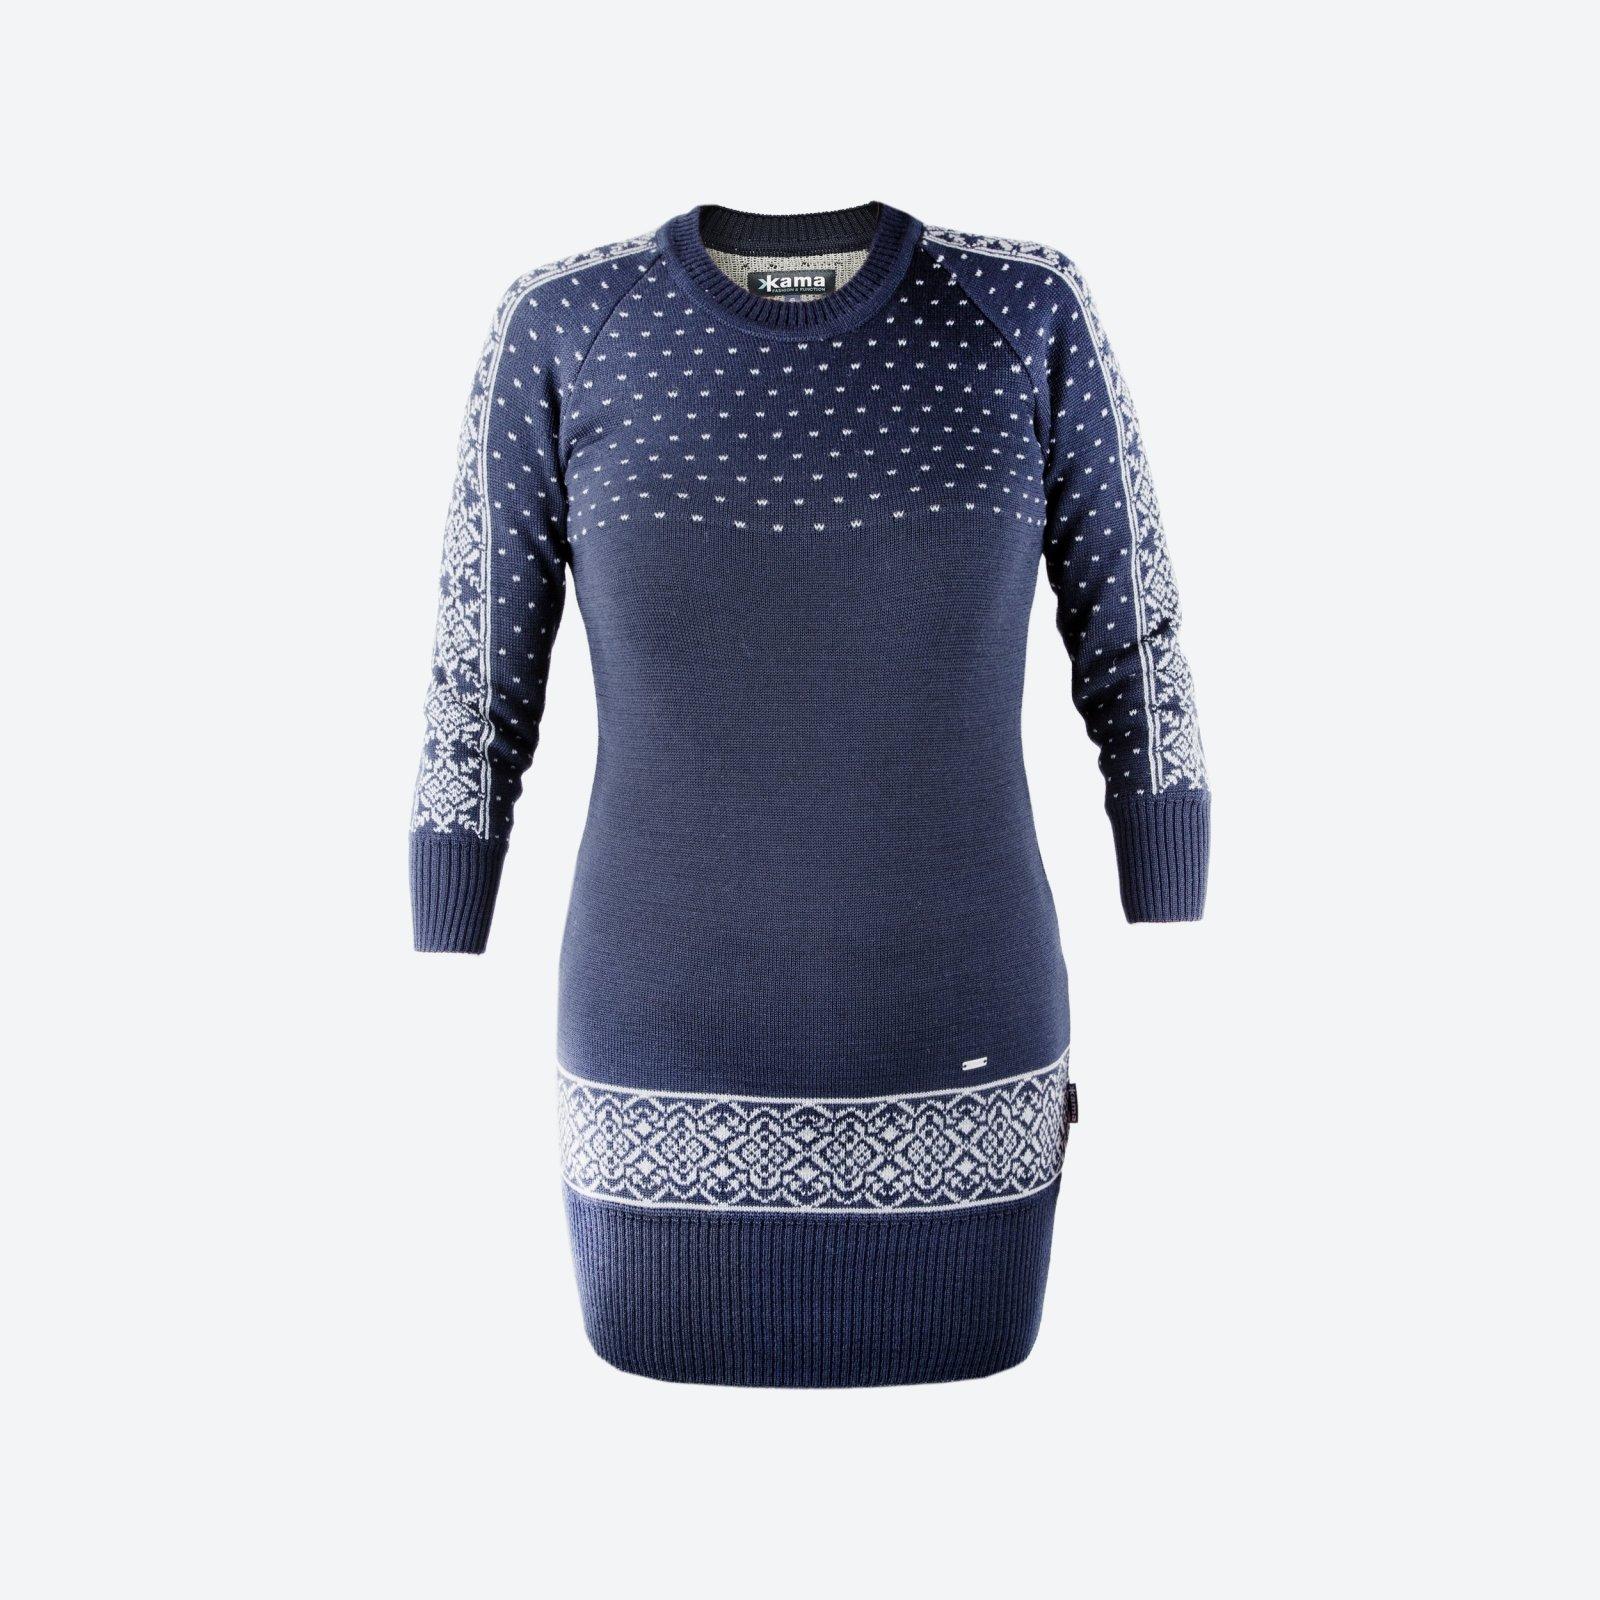 dacc8550a Pletené Merino šaty Kama 5016 108 tm.modrá